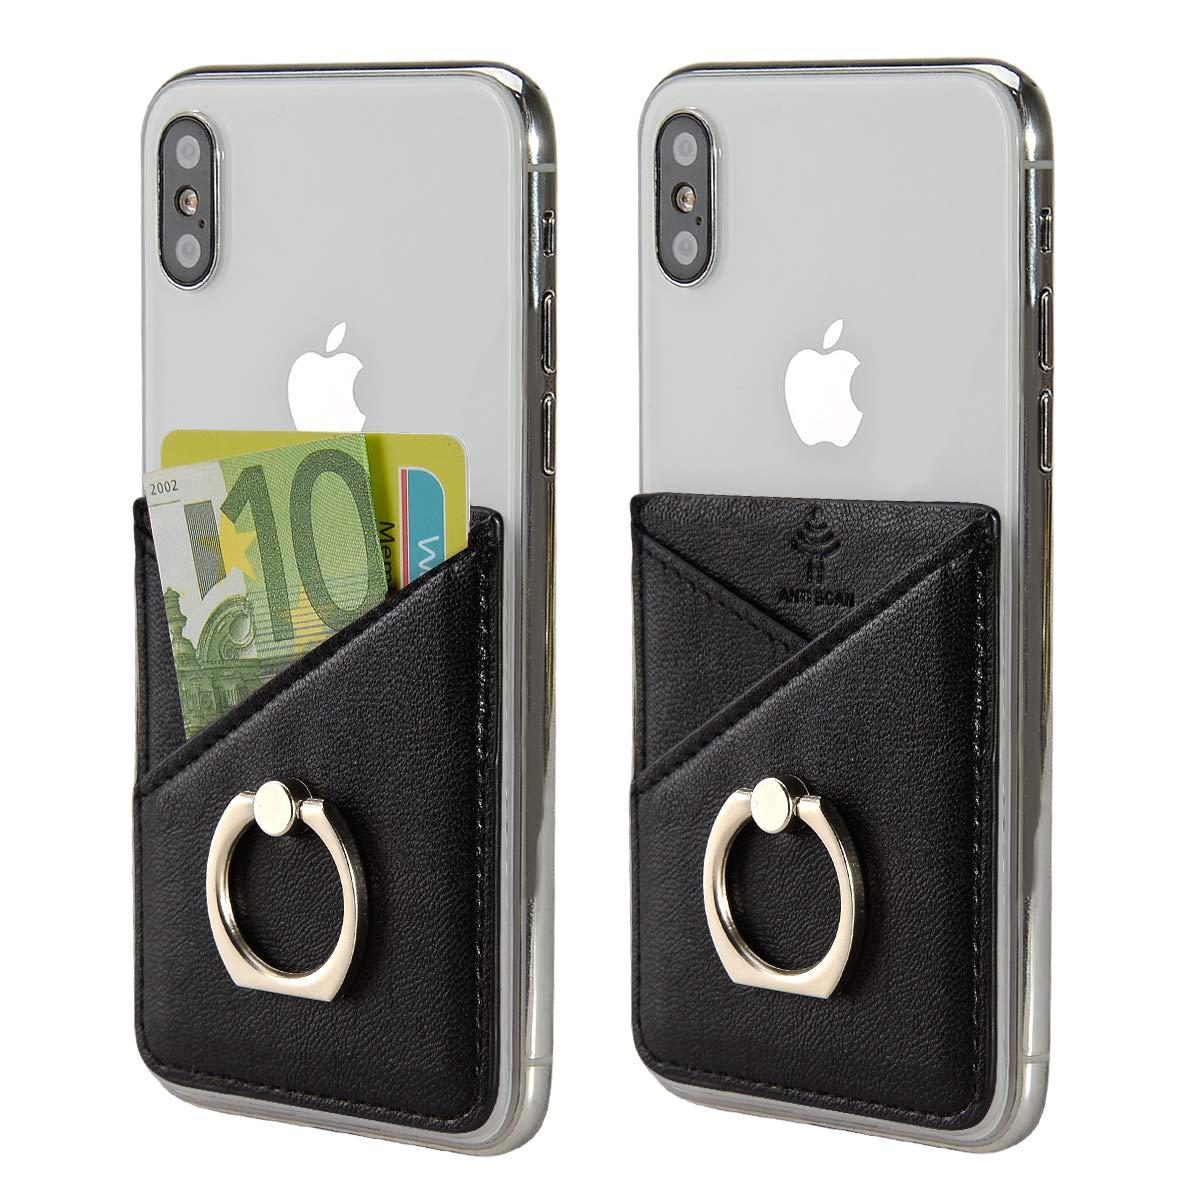 takyu Card Holder Phone Sticker with Ring